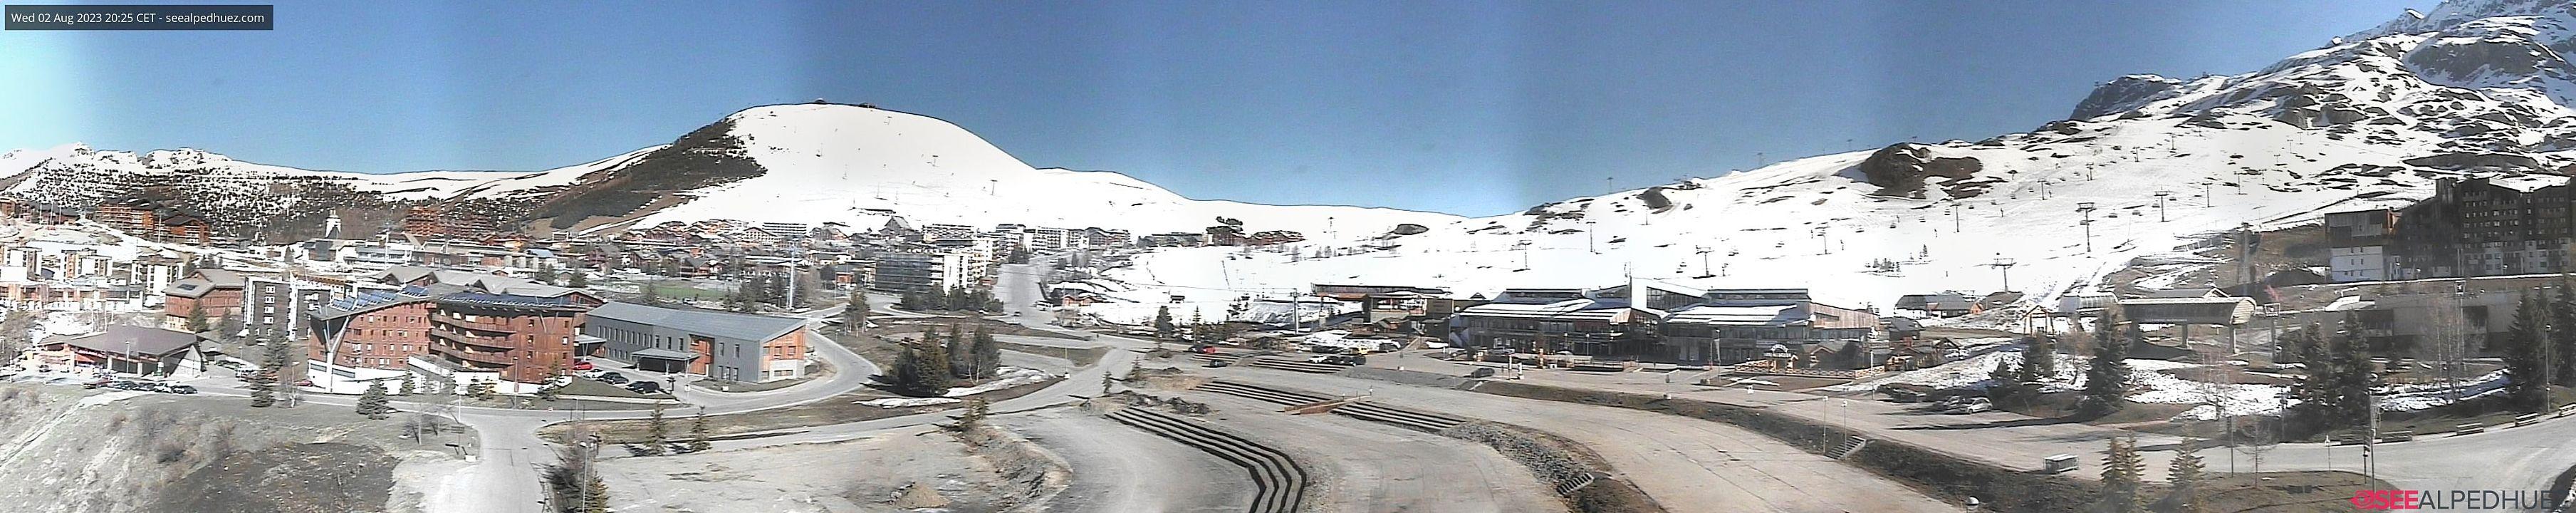 Web Cam - Alpe d'Huez